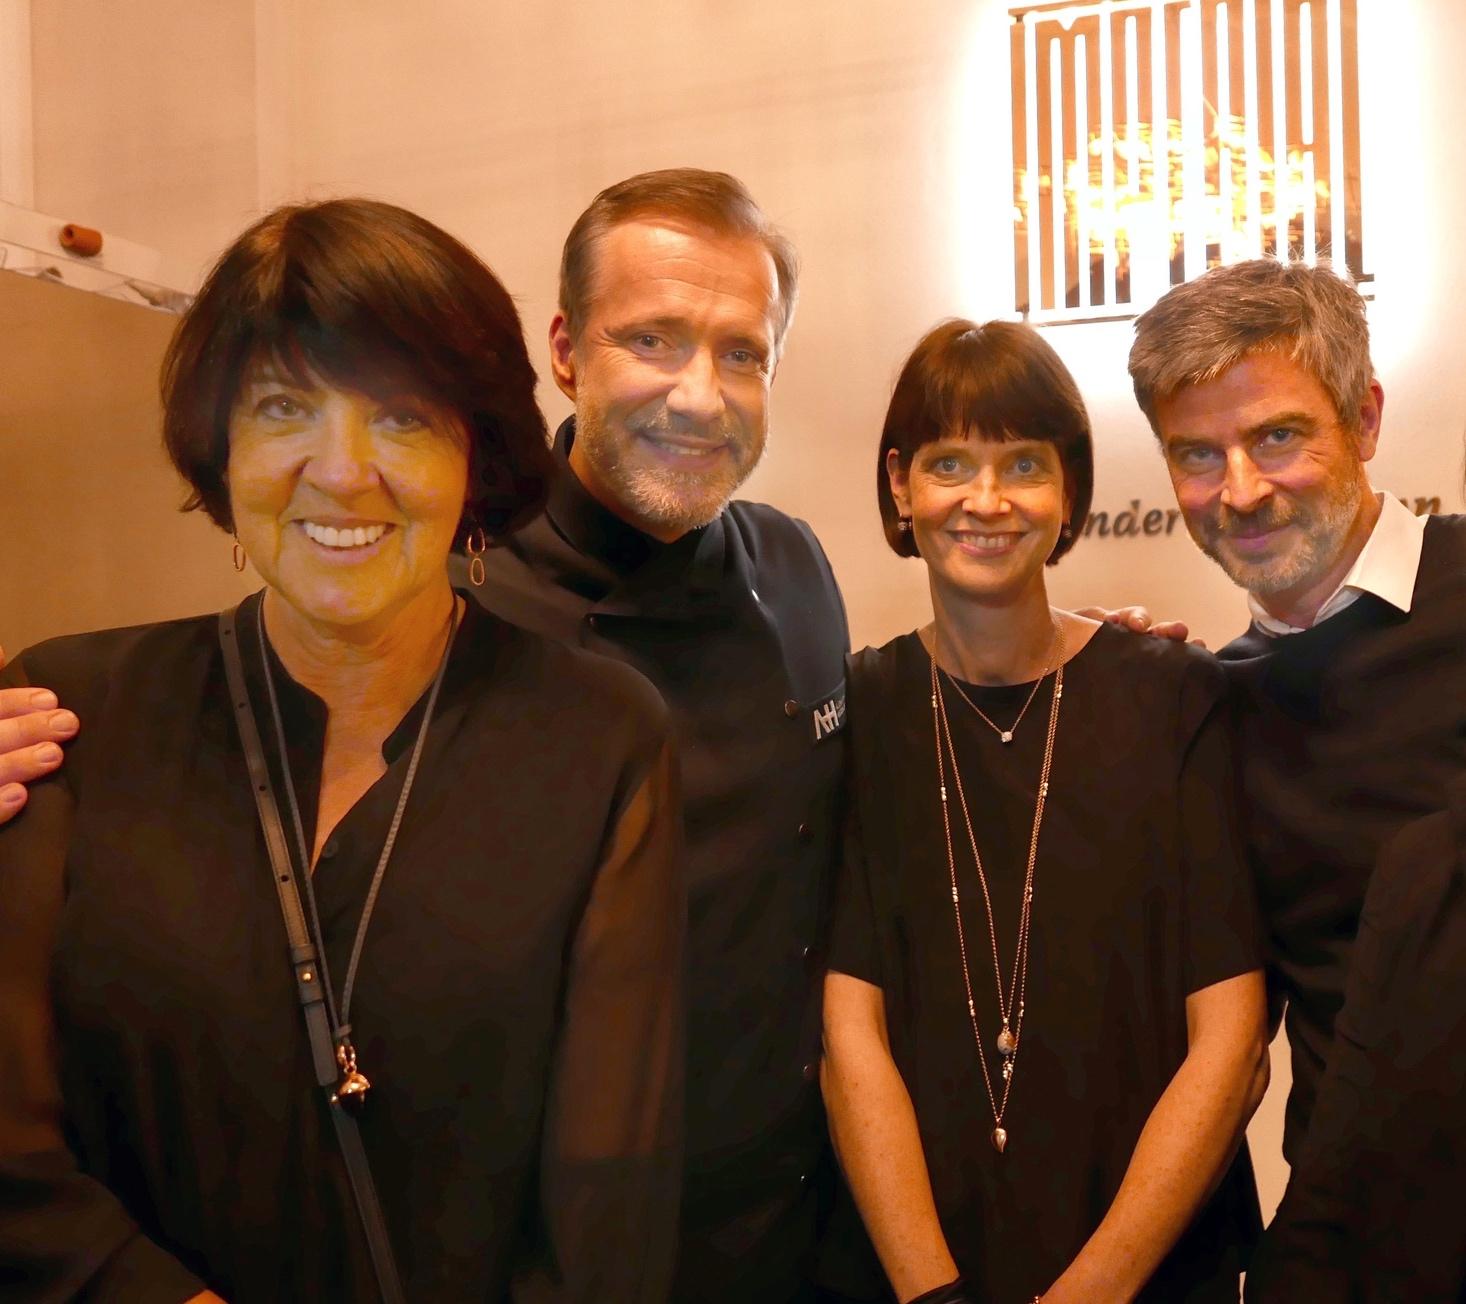 Eva Grossmann, Alexander Herrmann, Doris Weiß und Björn Grossmann @Galerie Voigt